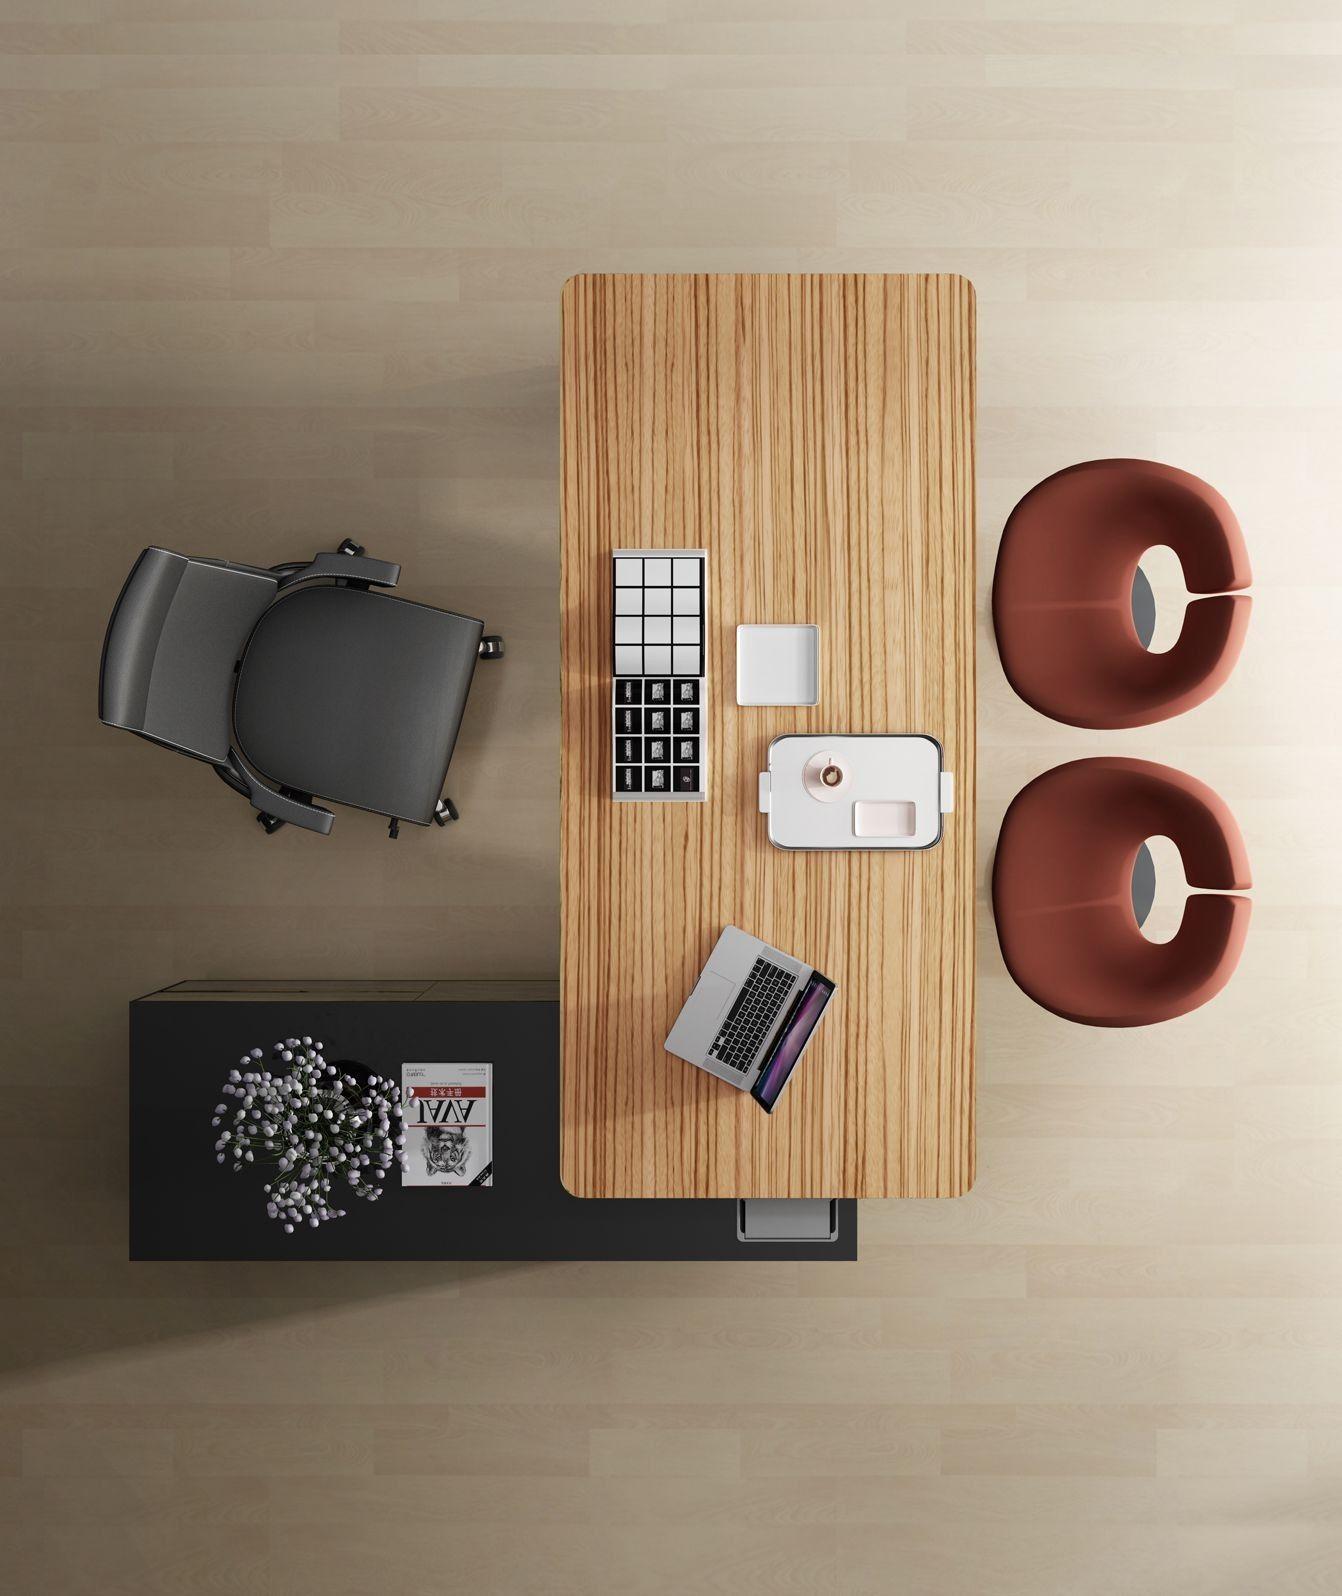 Modern Furniture Top View Google Search Office Furniture